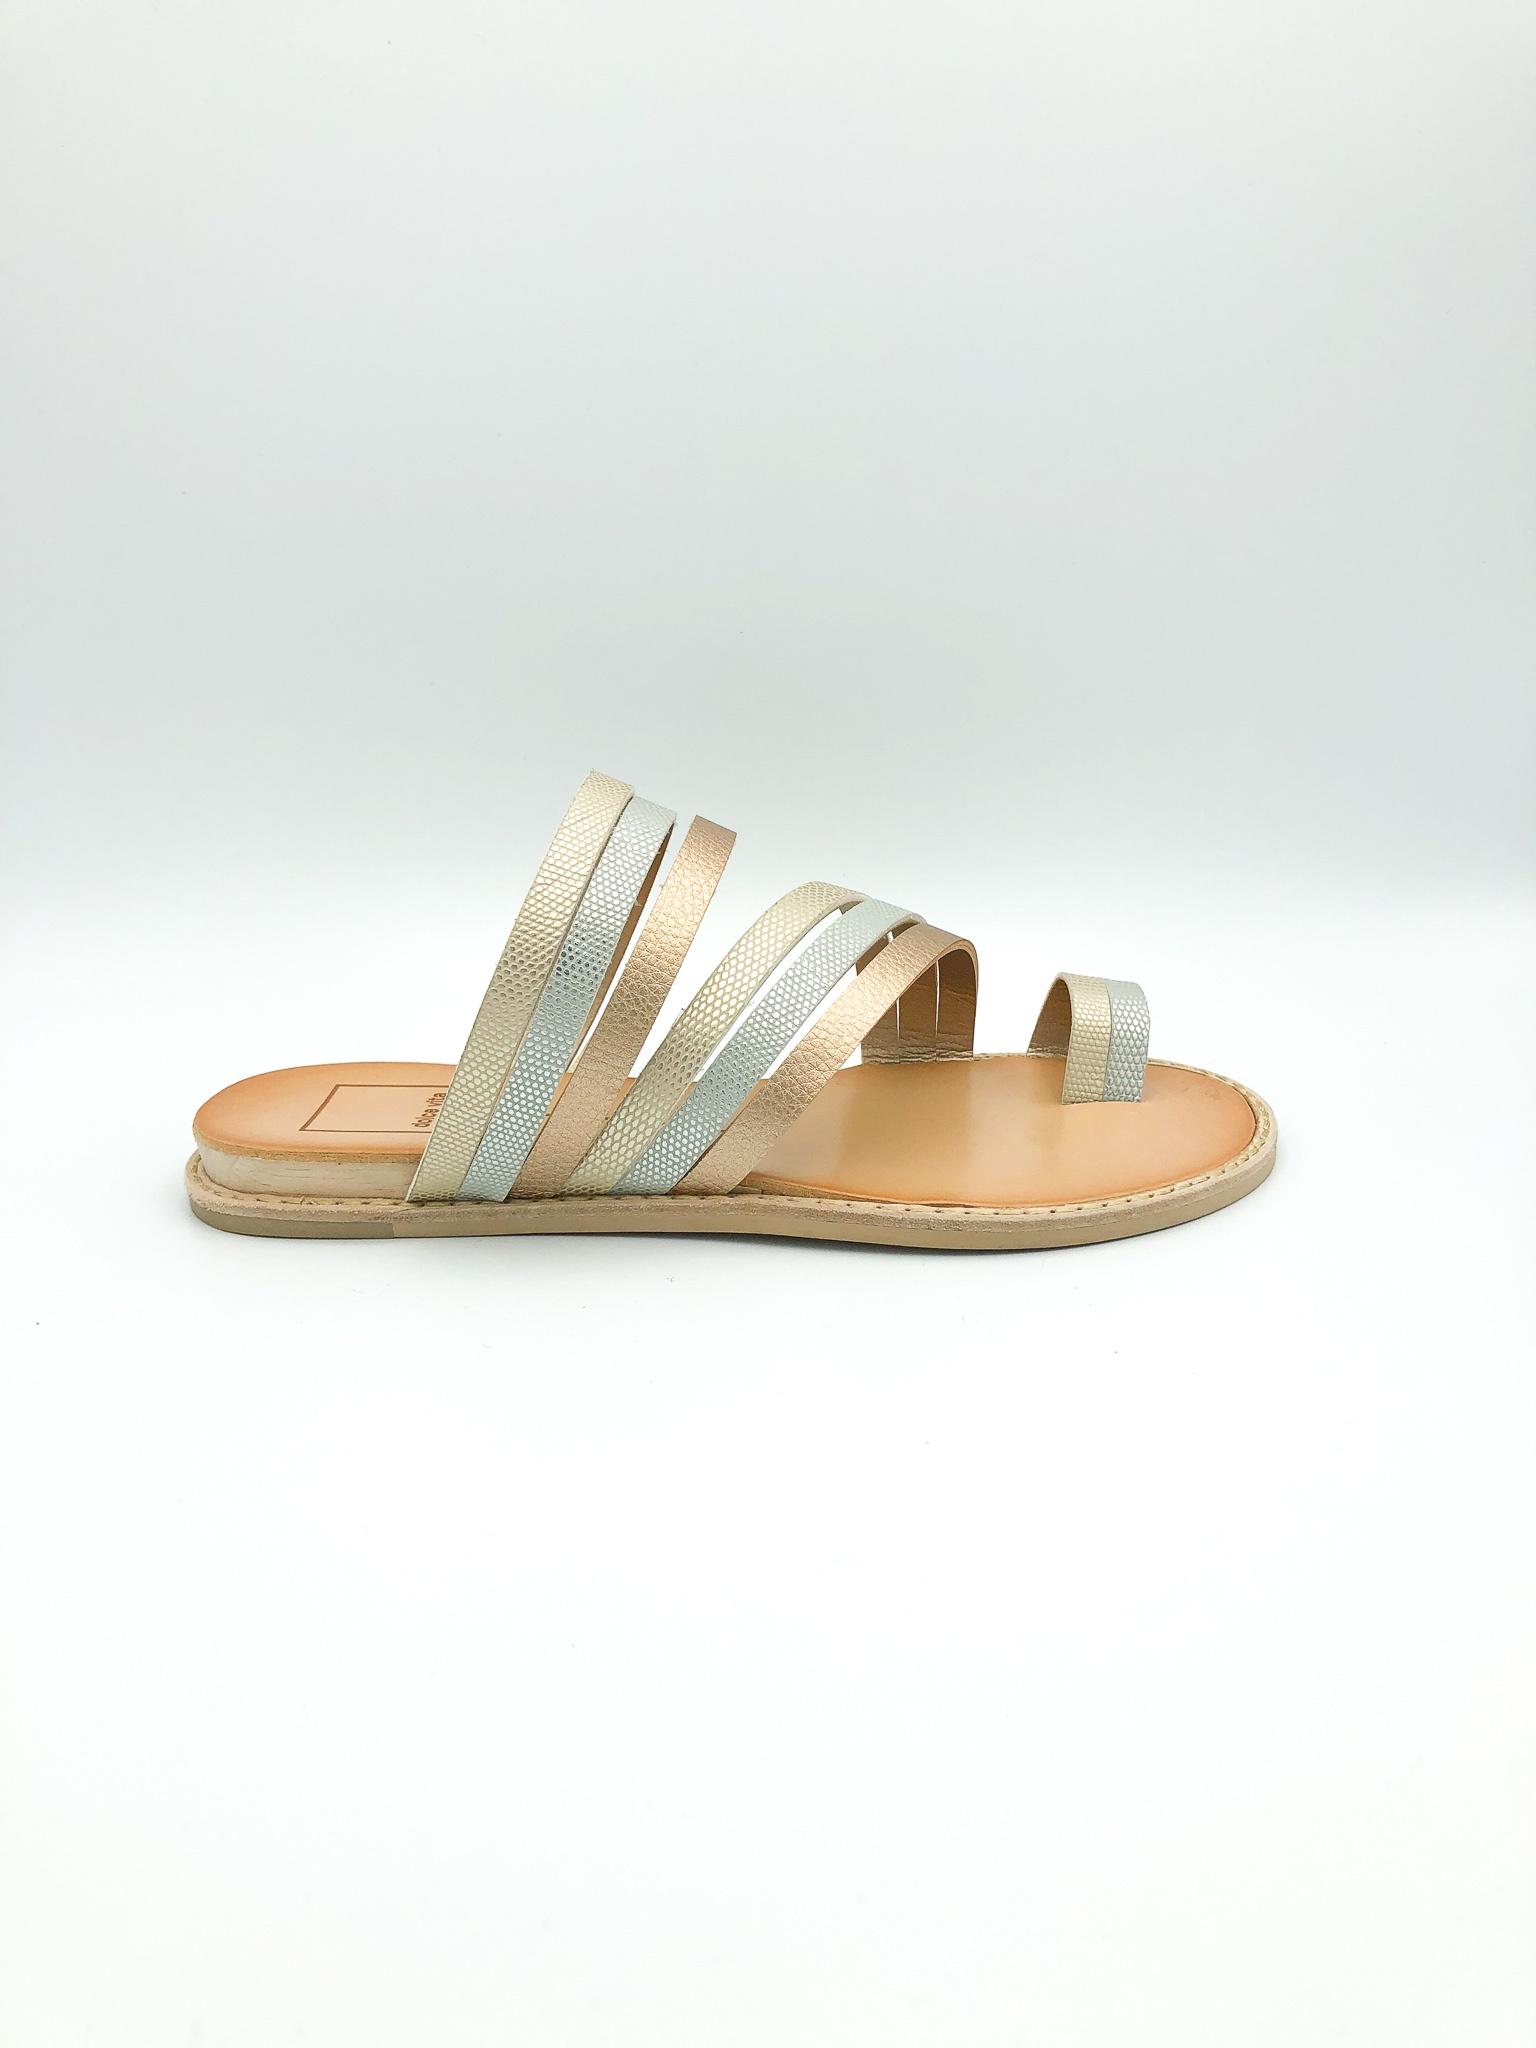 092ec50b1619 DOLCE VITA - NELLY SANDALS IN METALLIC - the Urban Shoe Myth